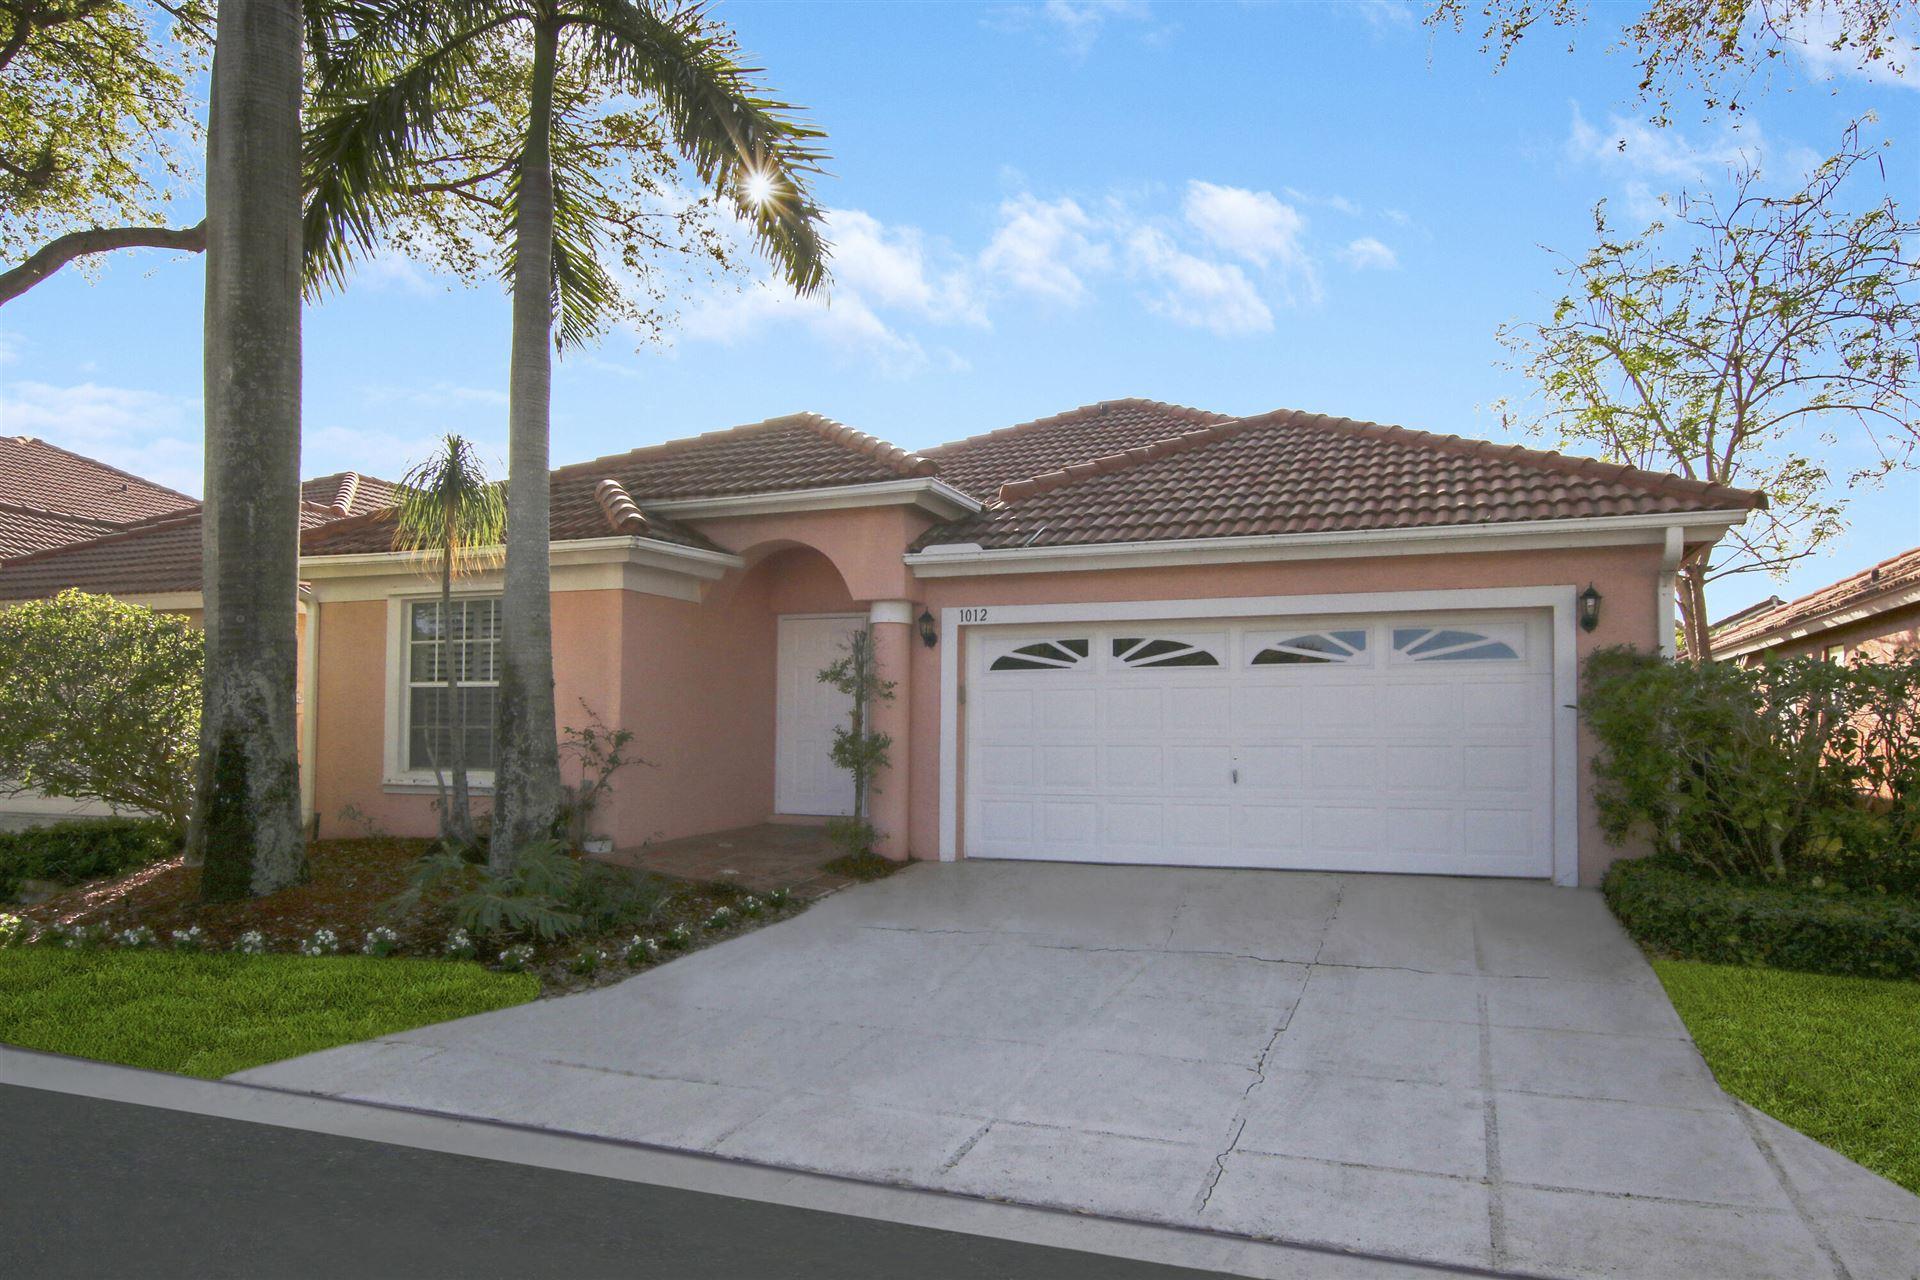 1012 Aspri Way, Riviera Beach, FL 33418 - #: RX-10693732